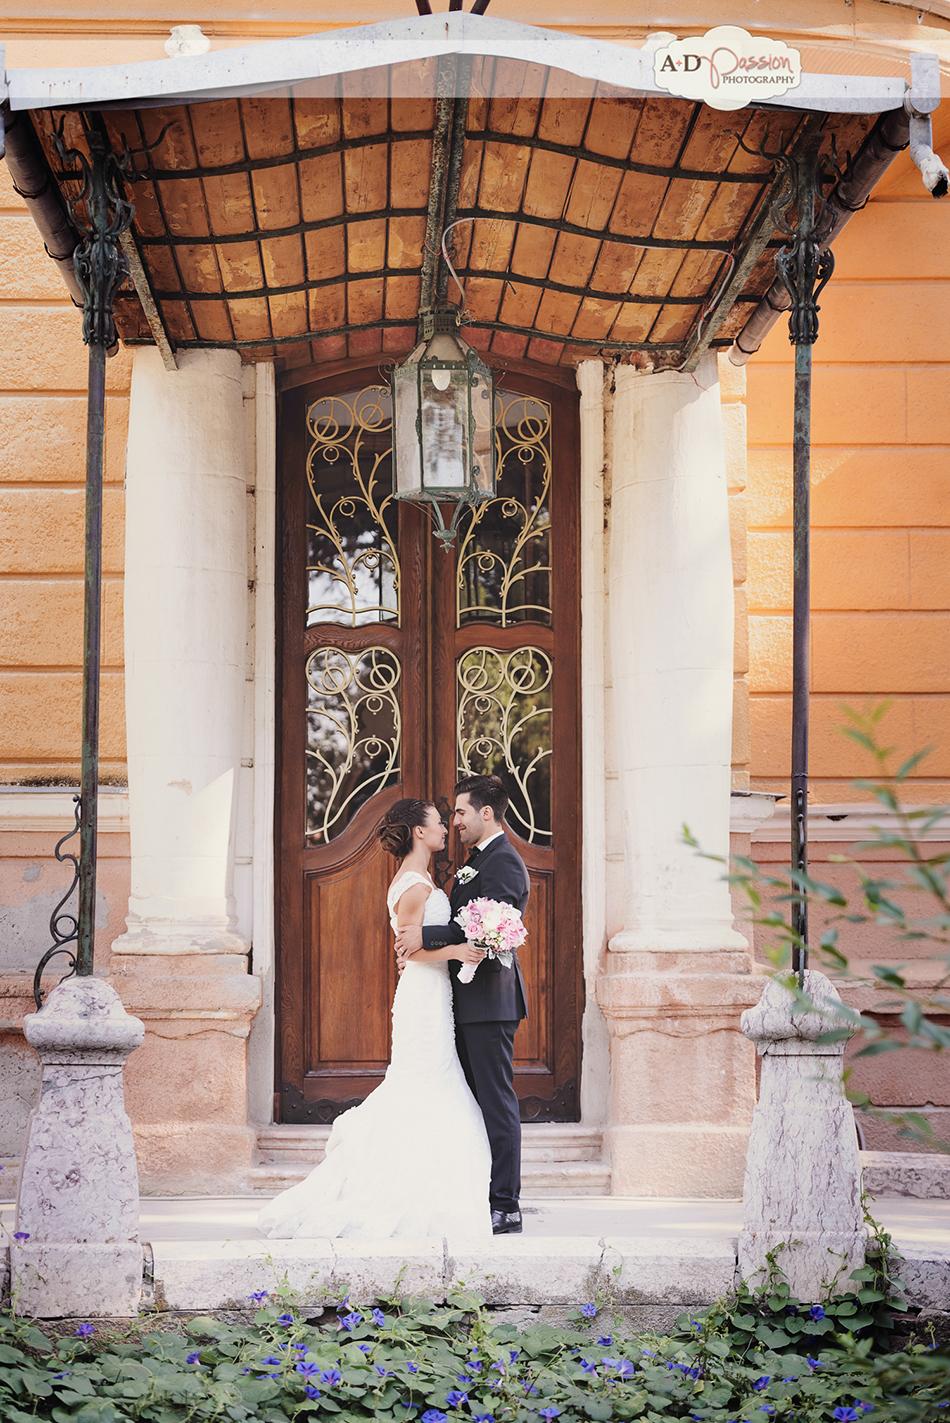 AD Passion Photography | 20130804_ana+calin_fotografie-vintage_fotograf-nunta-oradea_fotograf-profesionist_0048 | Adelin, Dida, fotograf profesionist, fotograf de nunta, fotografie de nunta, fotograf Timisoara, fotograf Craiova, fotograf Bucuresti, fotograf Arad, nunta Timisoara, nunta Arad, nunta Bucuresti, nunta Craiova